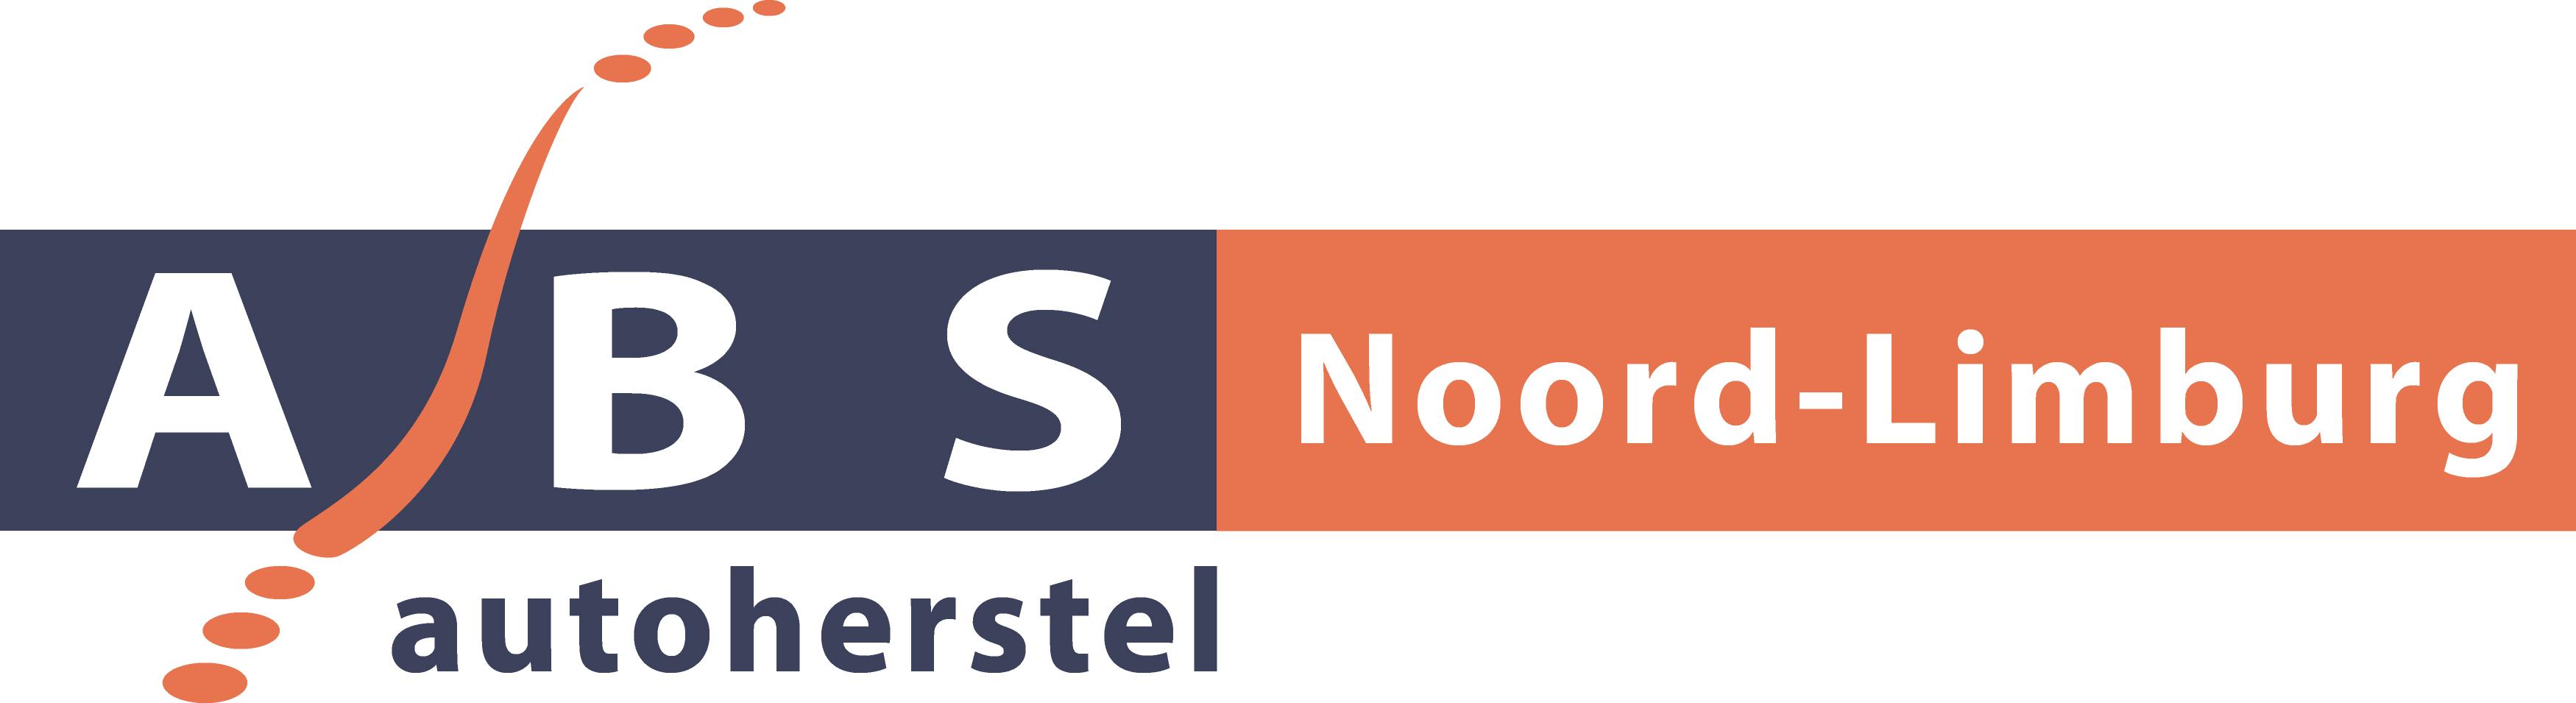 ABS AutoHerstel Noord-Limburg